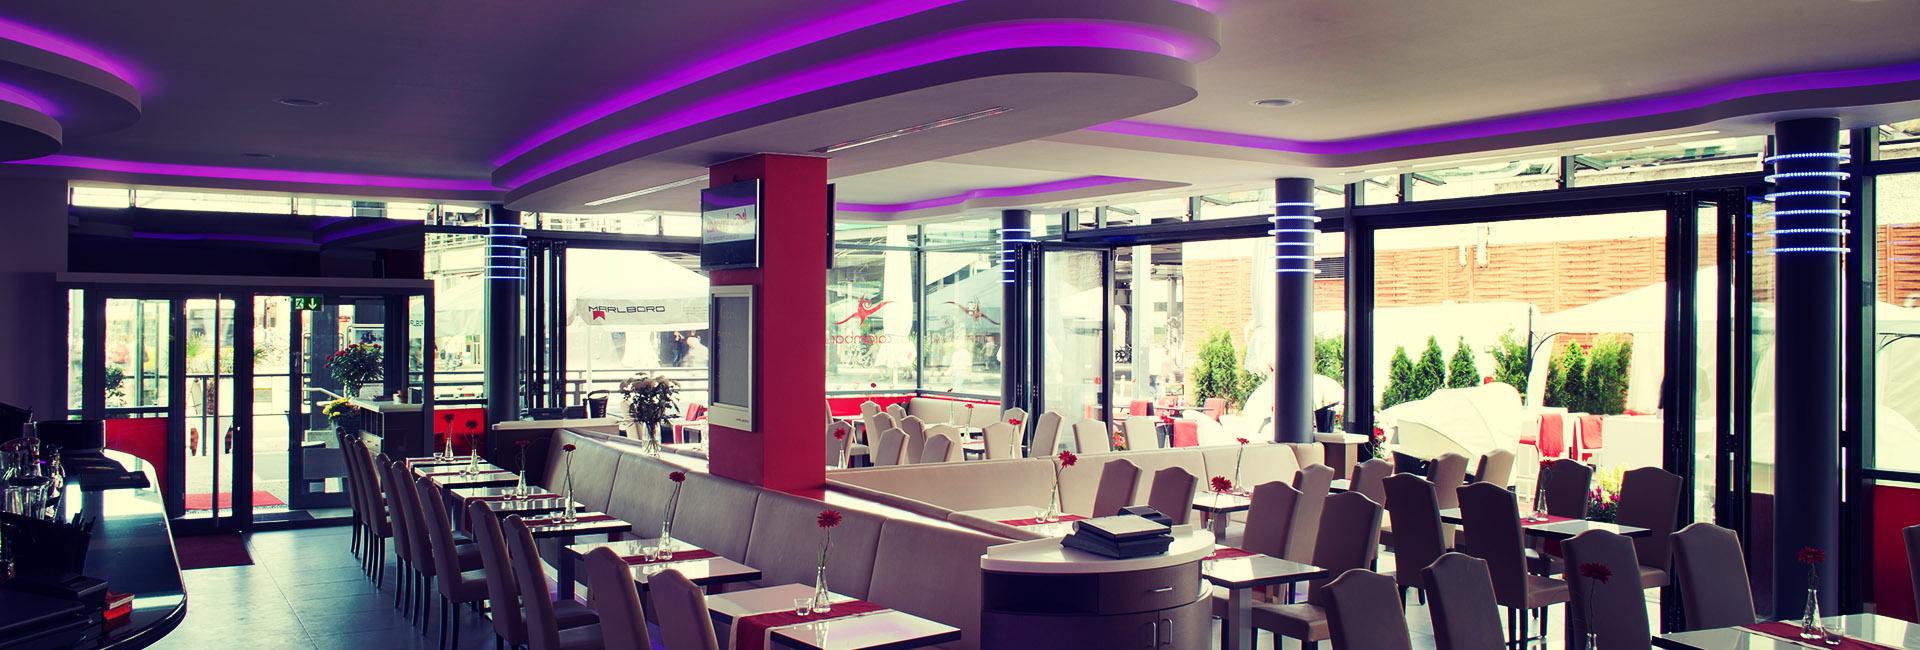 carambar-bar-lounge-restaurant-eventlocation-alexanderplatz-berlin-slider-1920x650-3